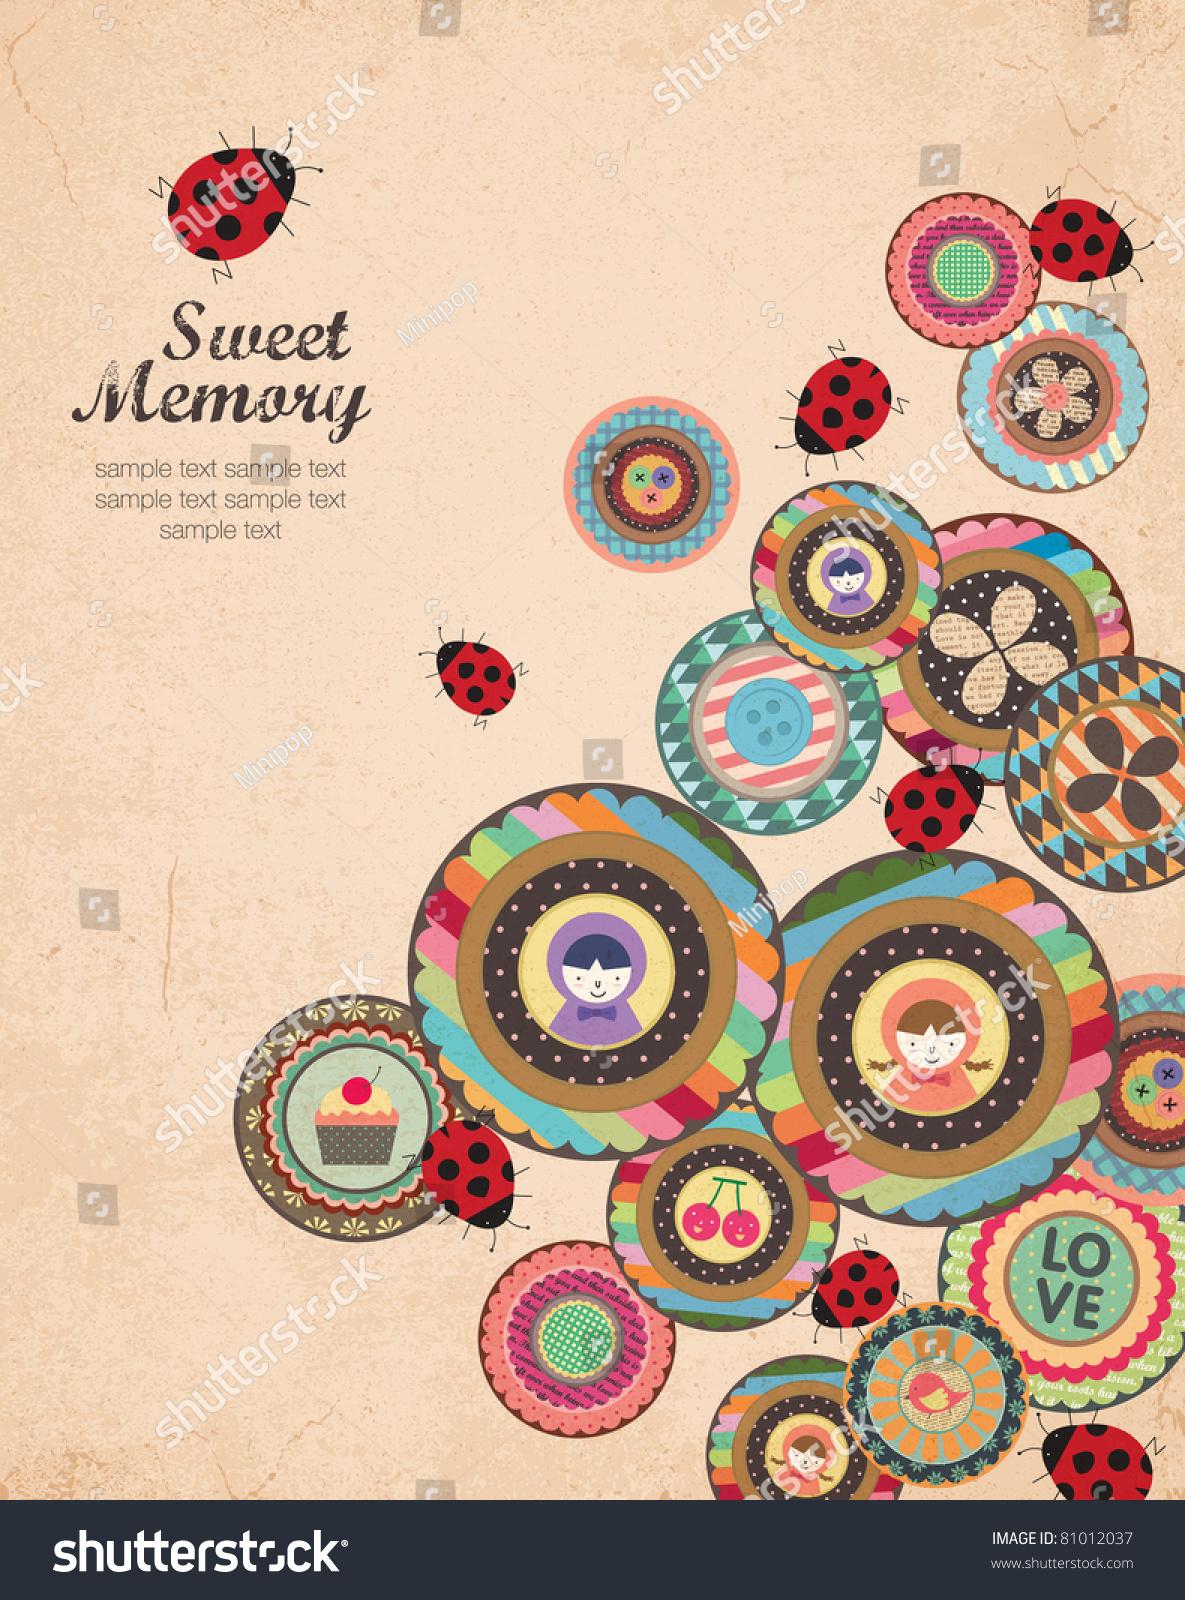 Scrapbook cover - Creative Cover And Album Art Design In Retro Style A Lot Of Scrapbook Element